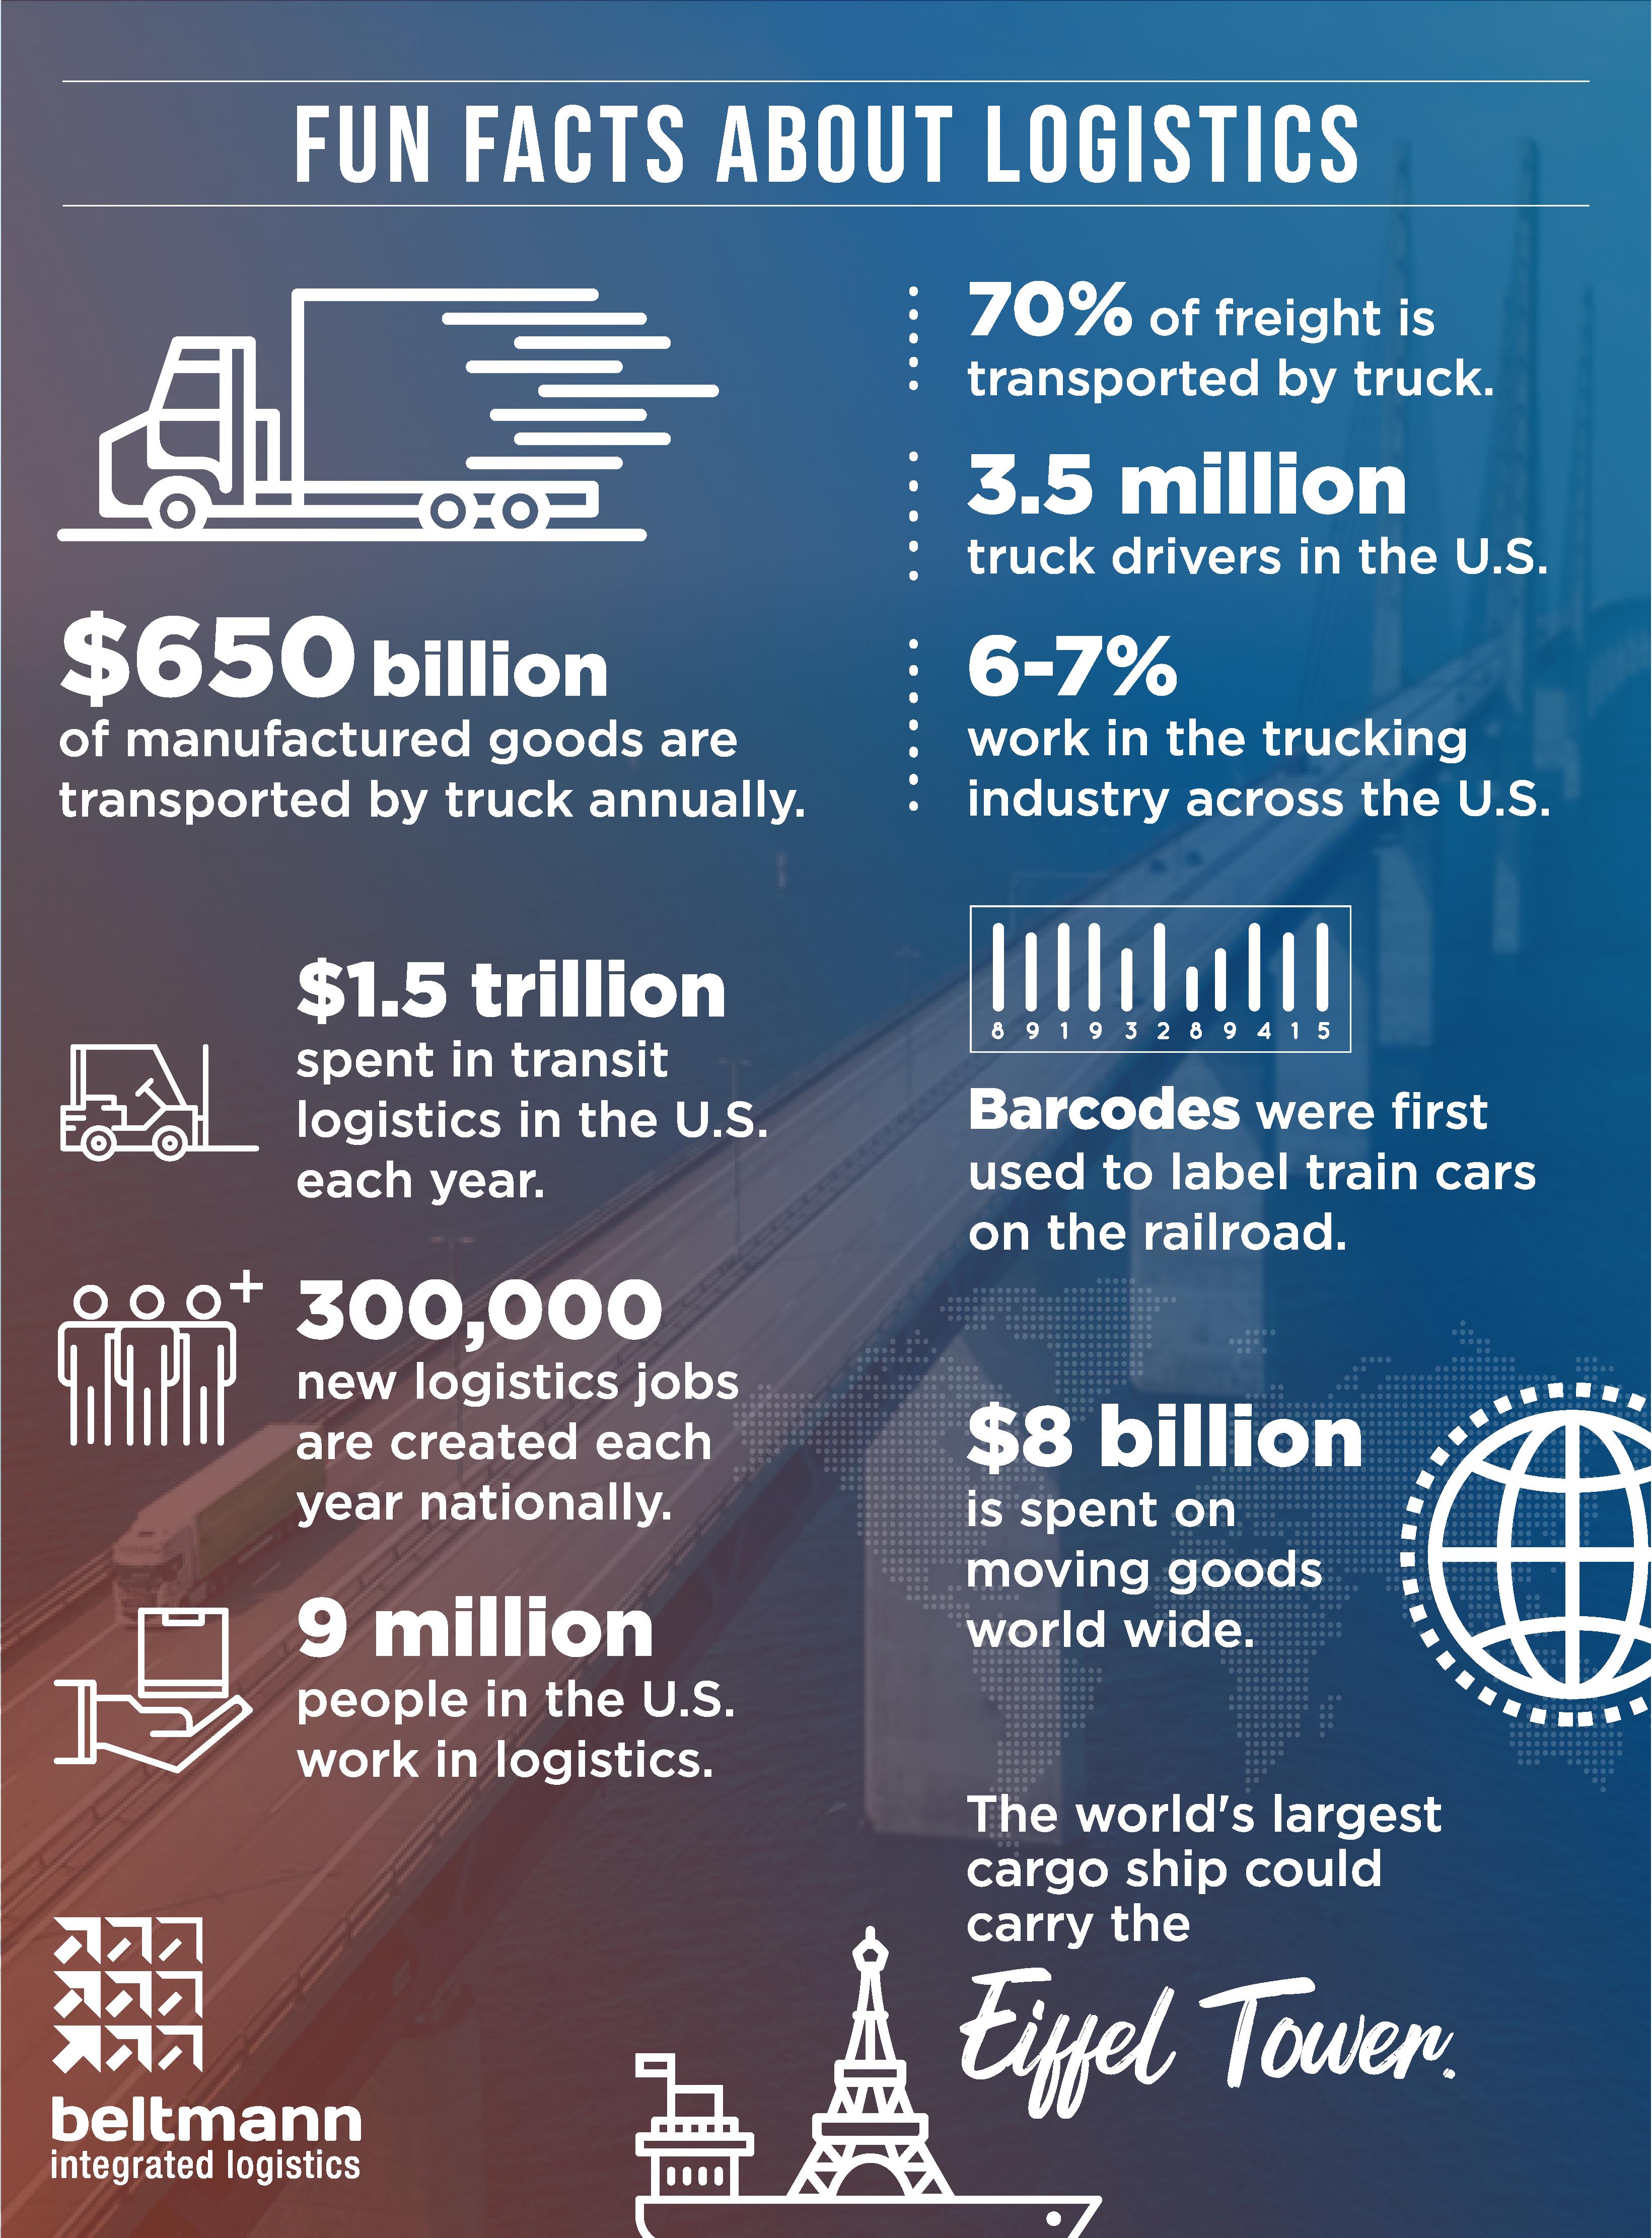 logistics-infographic-fun-facts